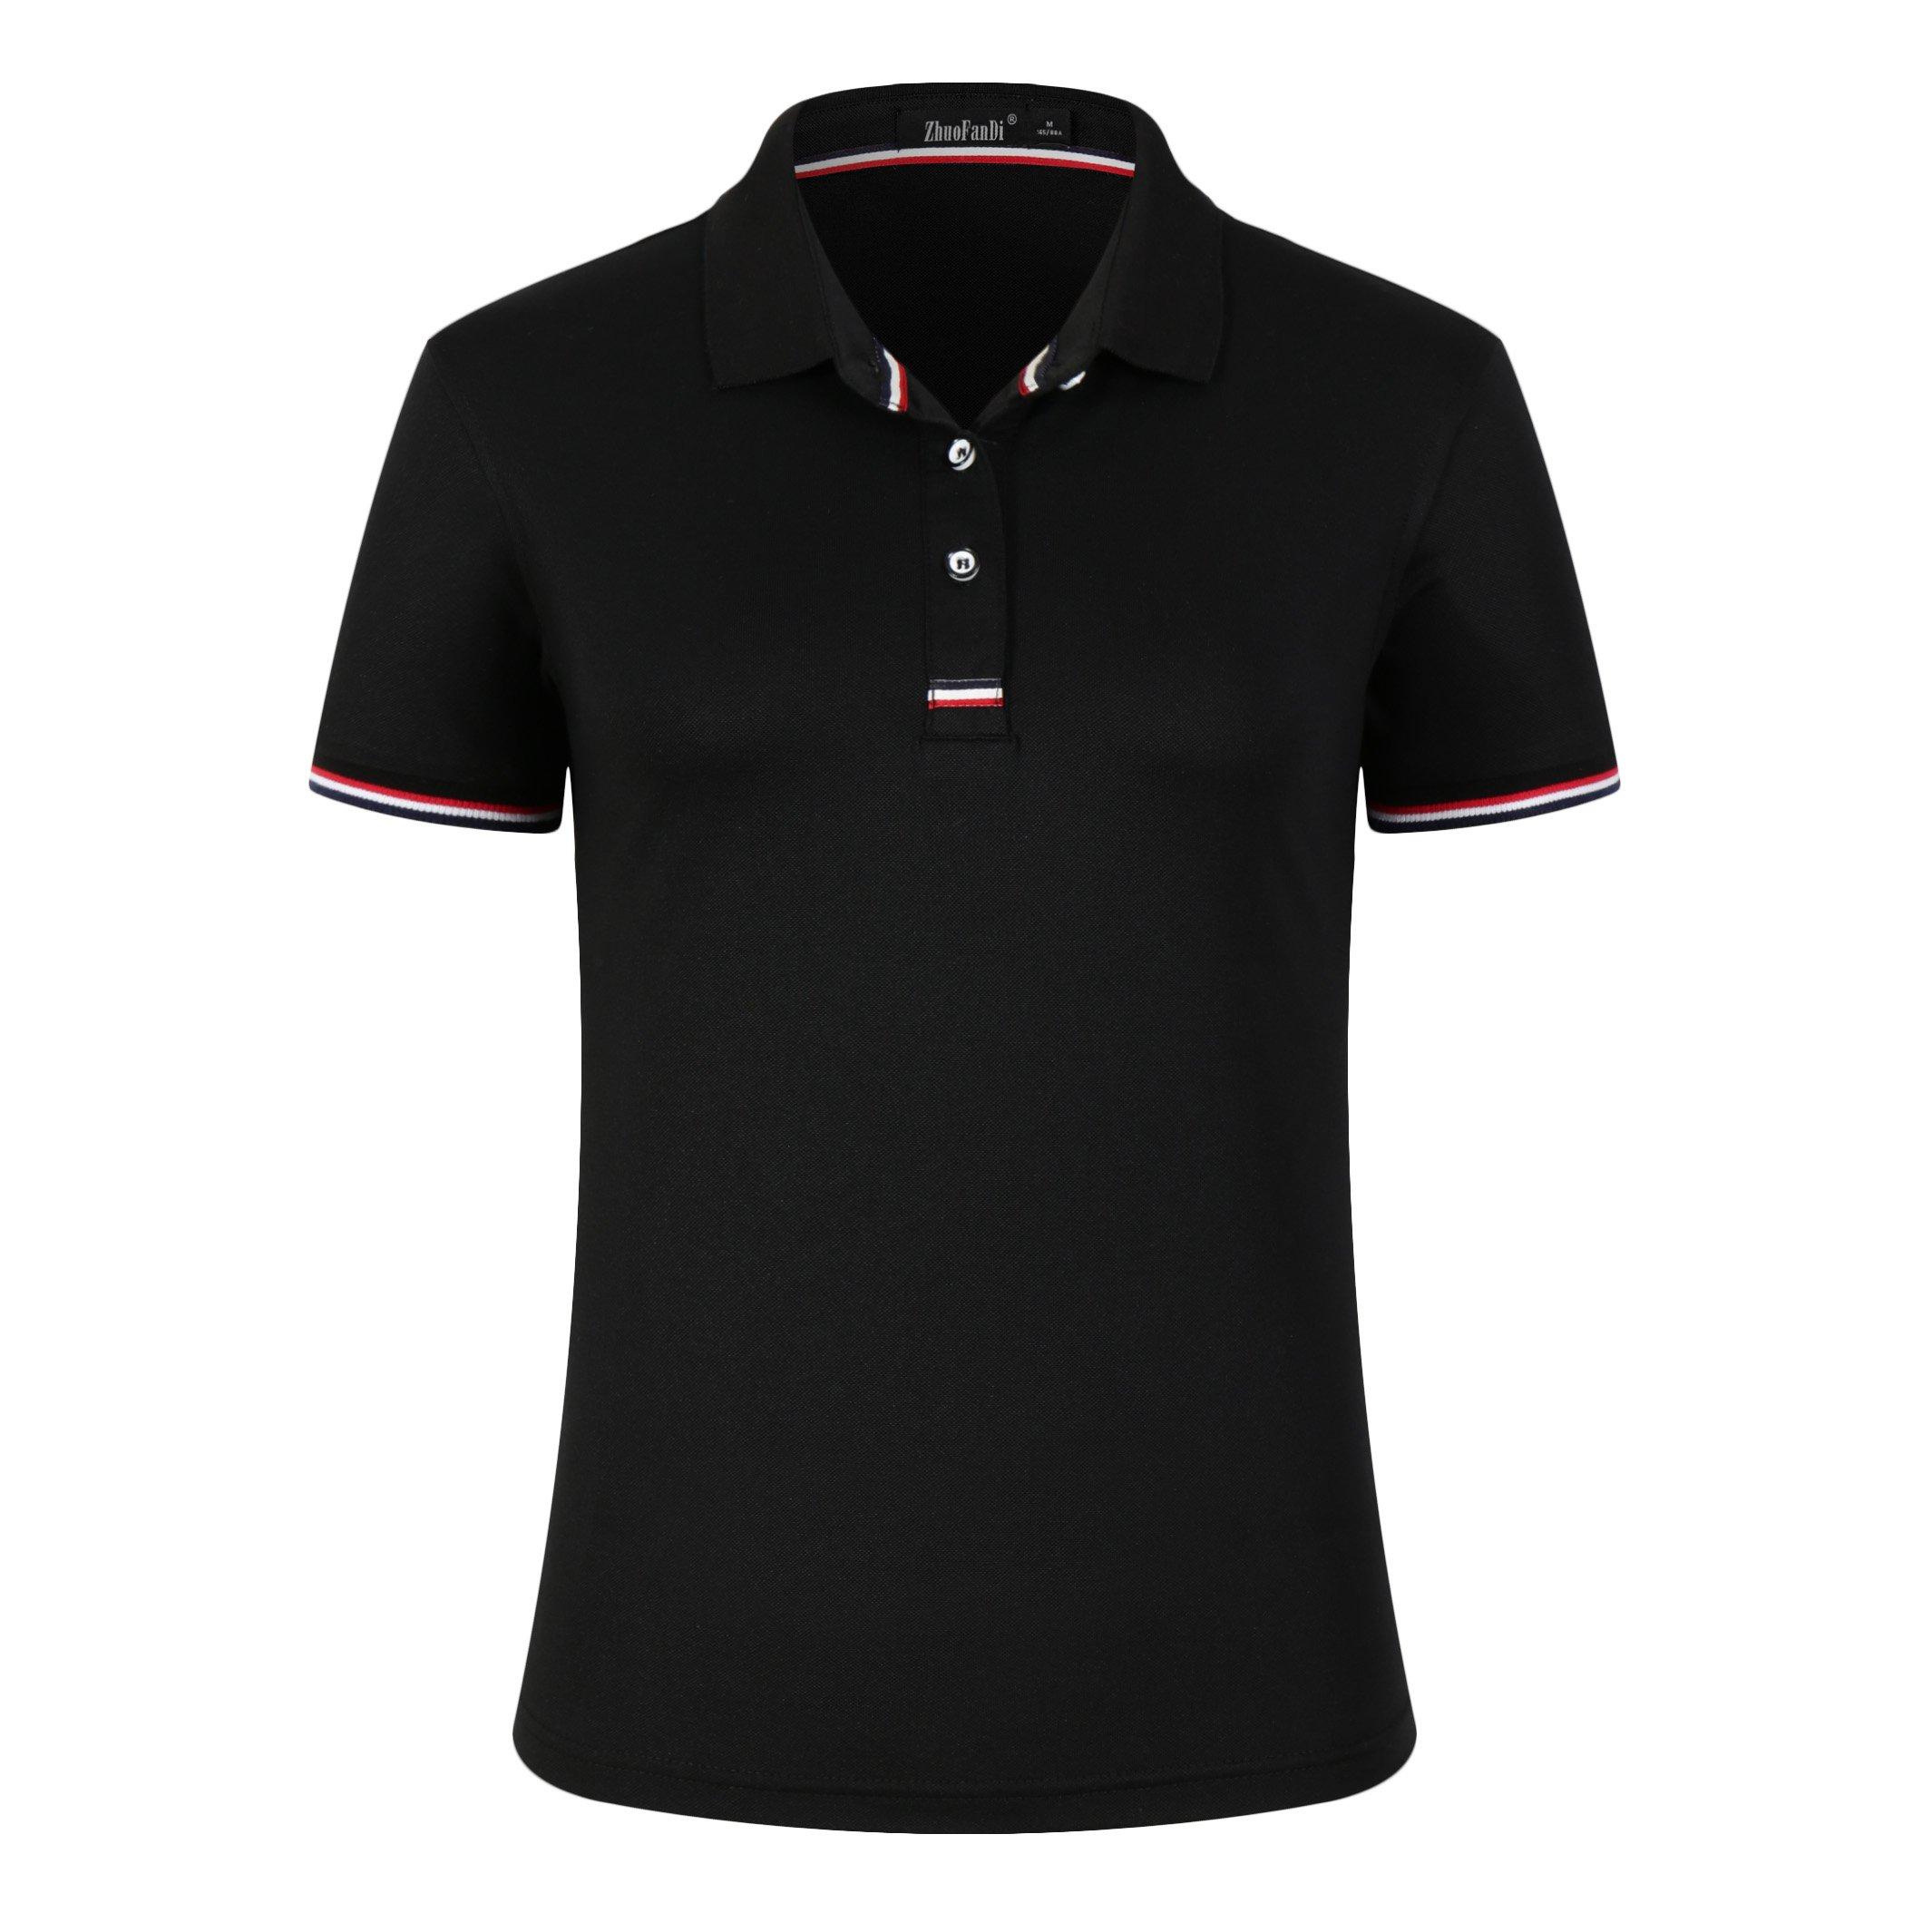 Women Classic Striped Collar Slim Fit Short Golf Polo Shirt Black S